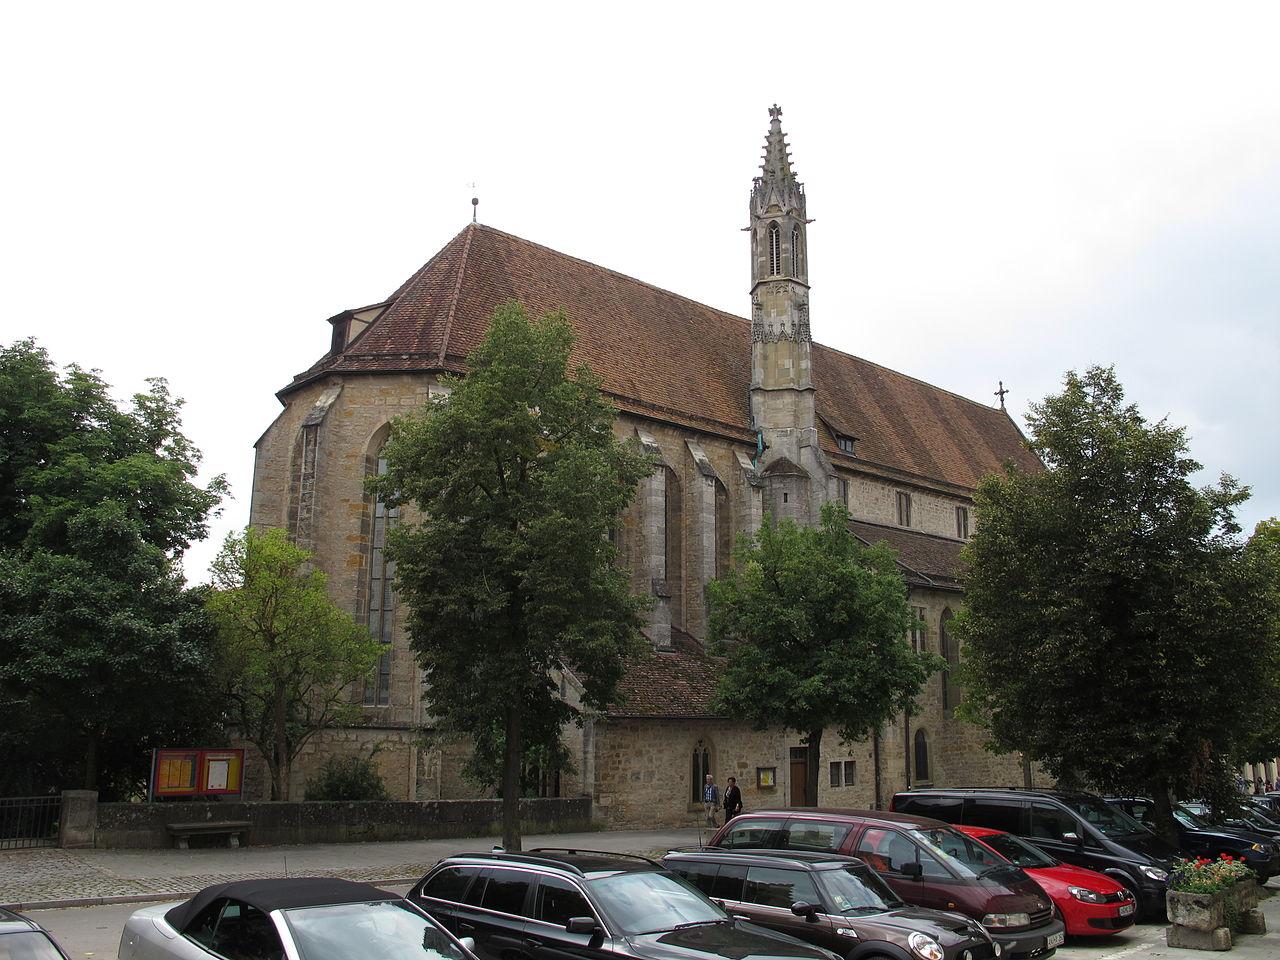 Bild Franziskanerkirche Rothenburg ob der Tauber